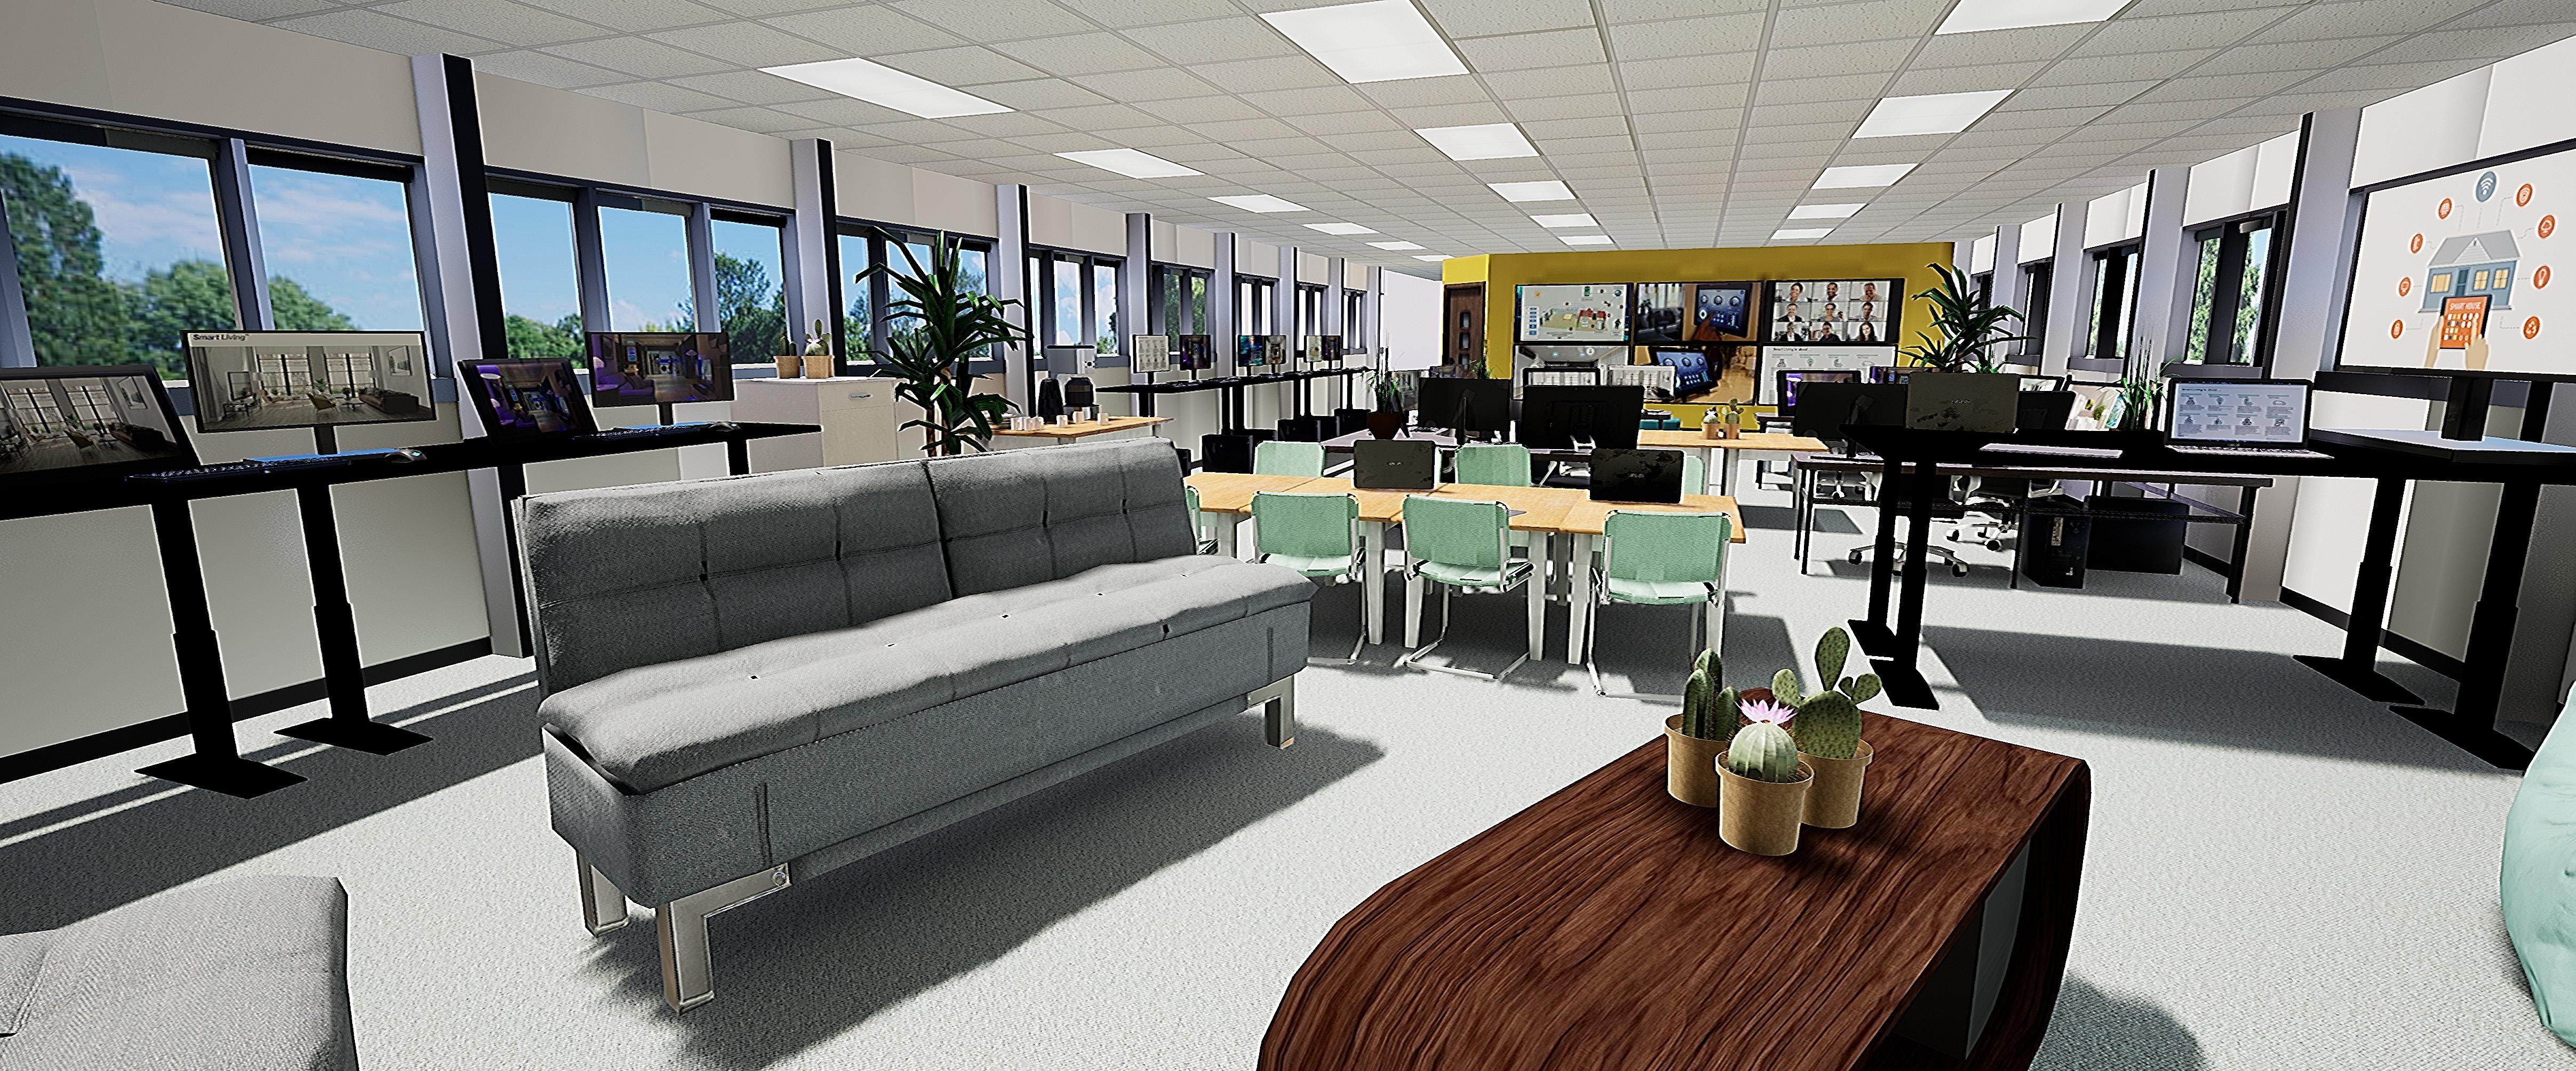 Adastral-Park Oberon-Office (8)